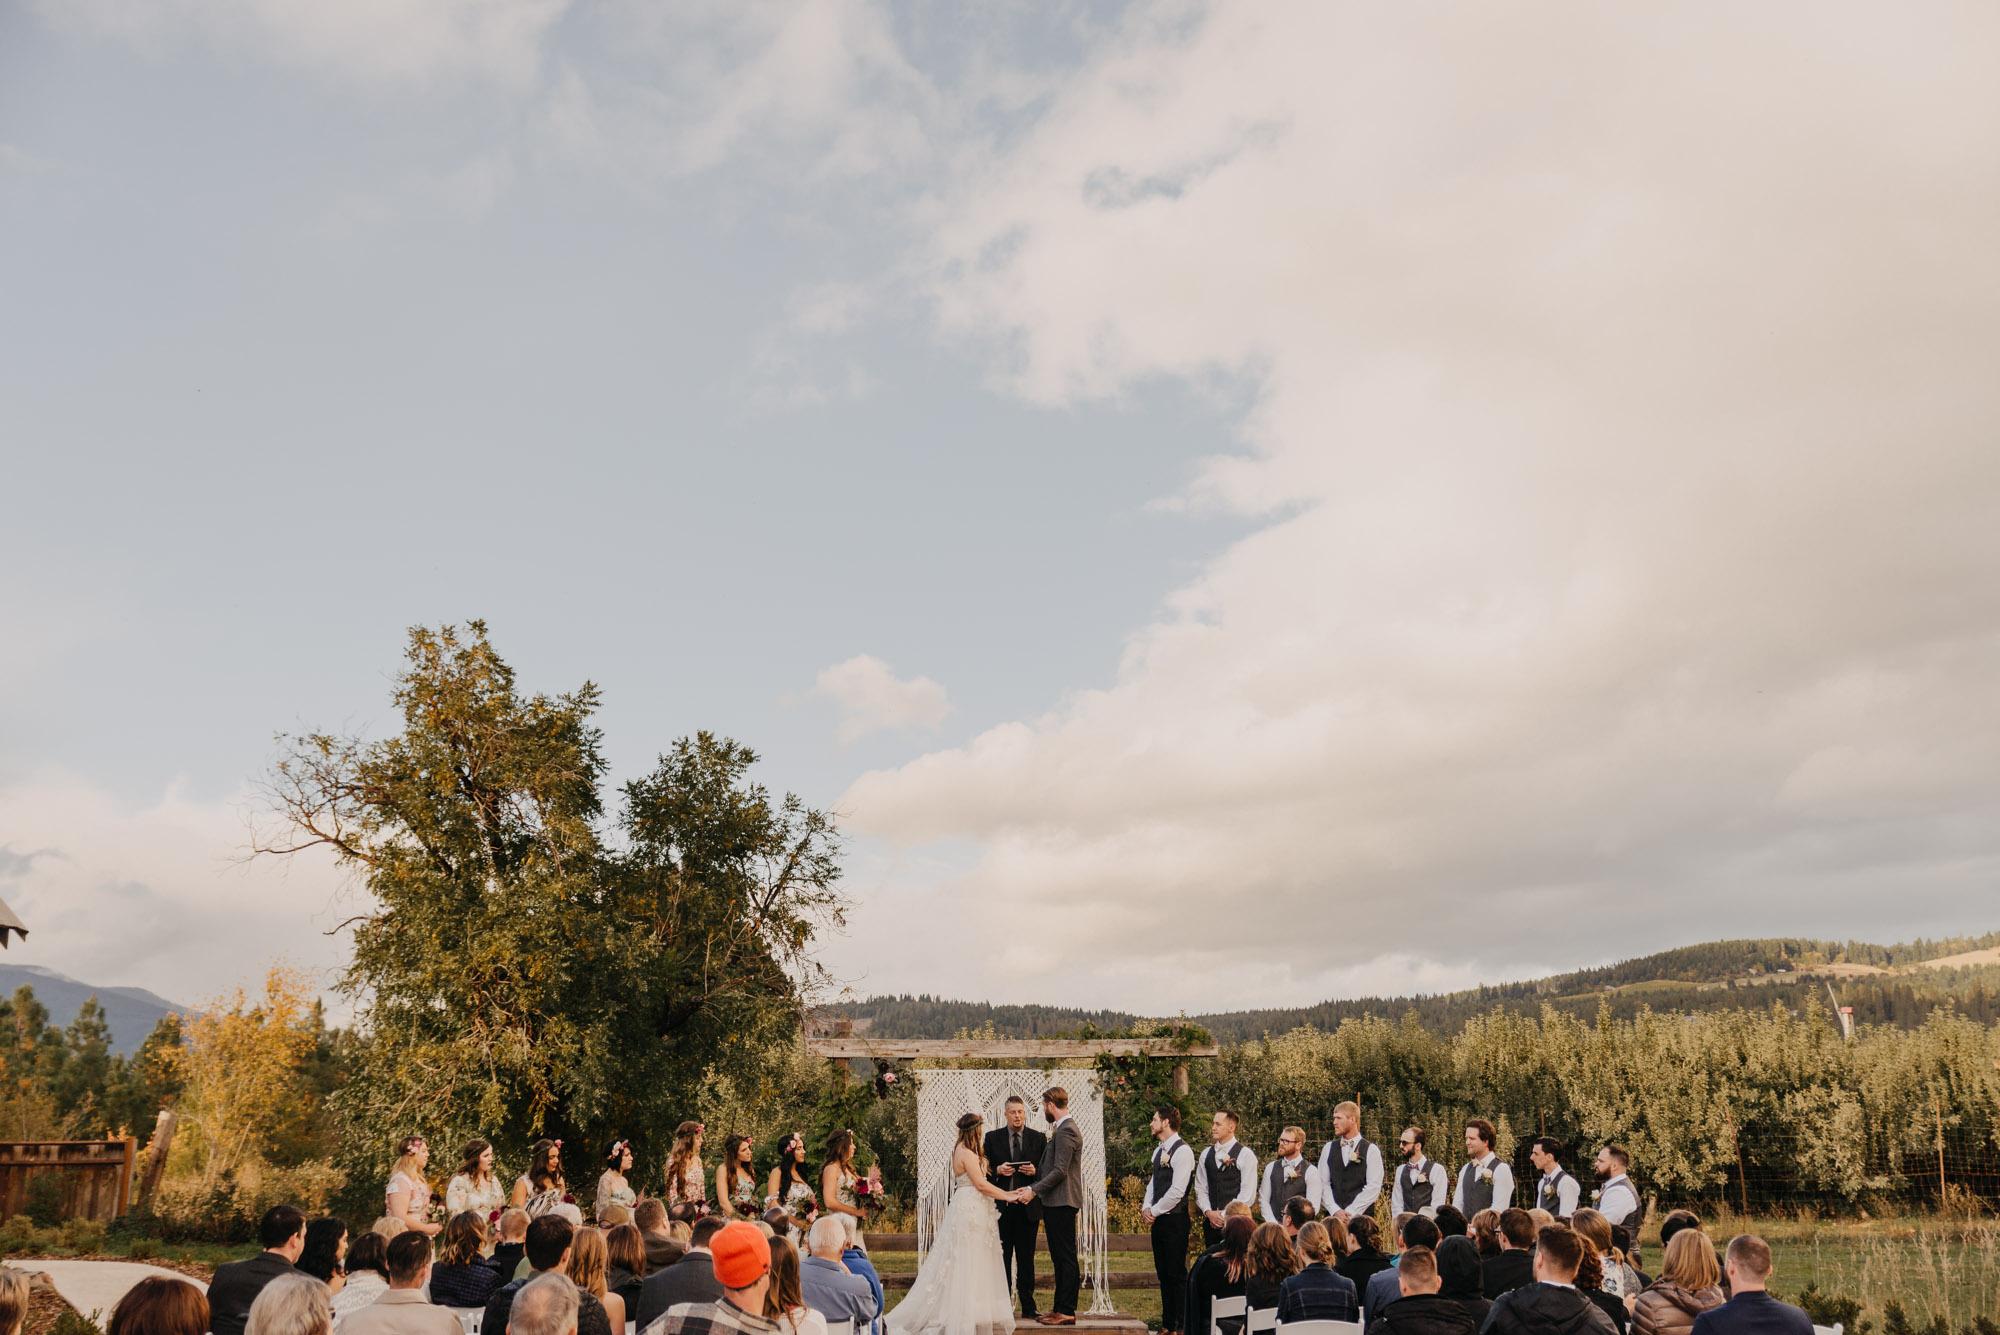 Outdoor-Summer-Ceremony-Washington-Wedding-Rainbow-5380.jpg